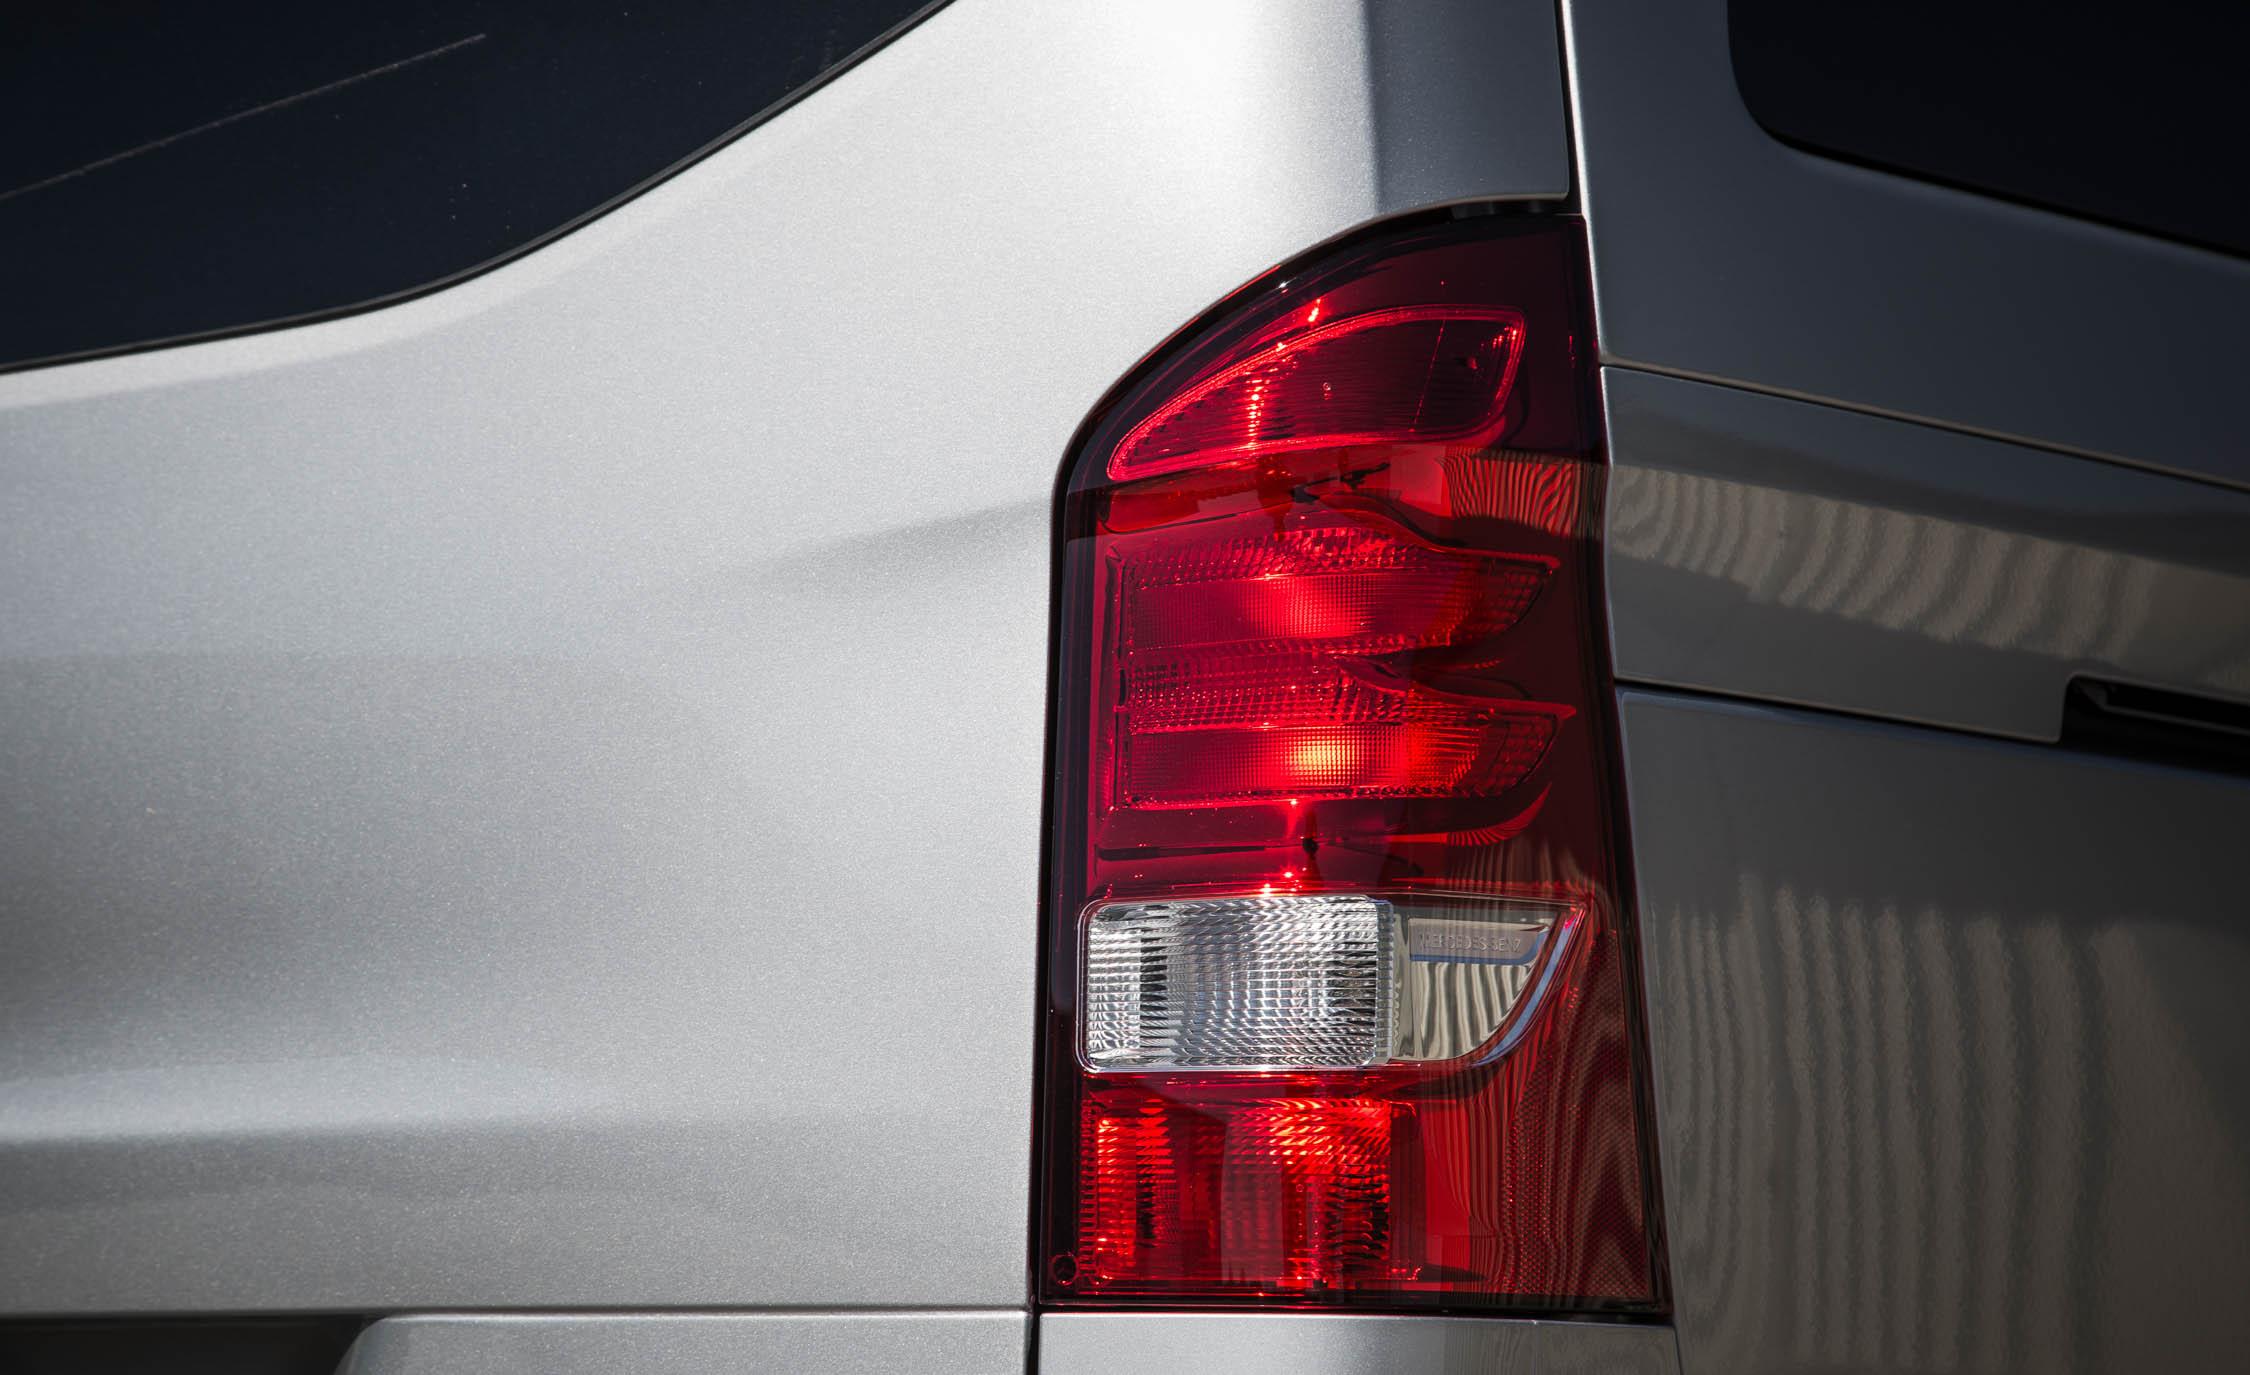 2016 Mercedes-Benz Metris Exterior Taillight